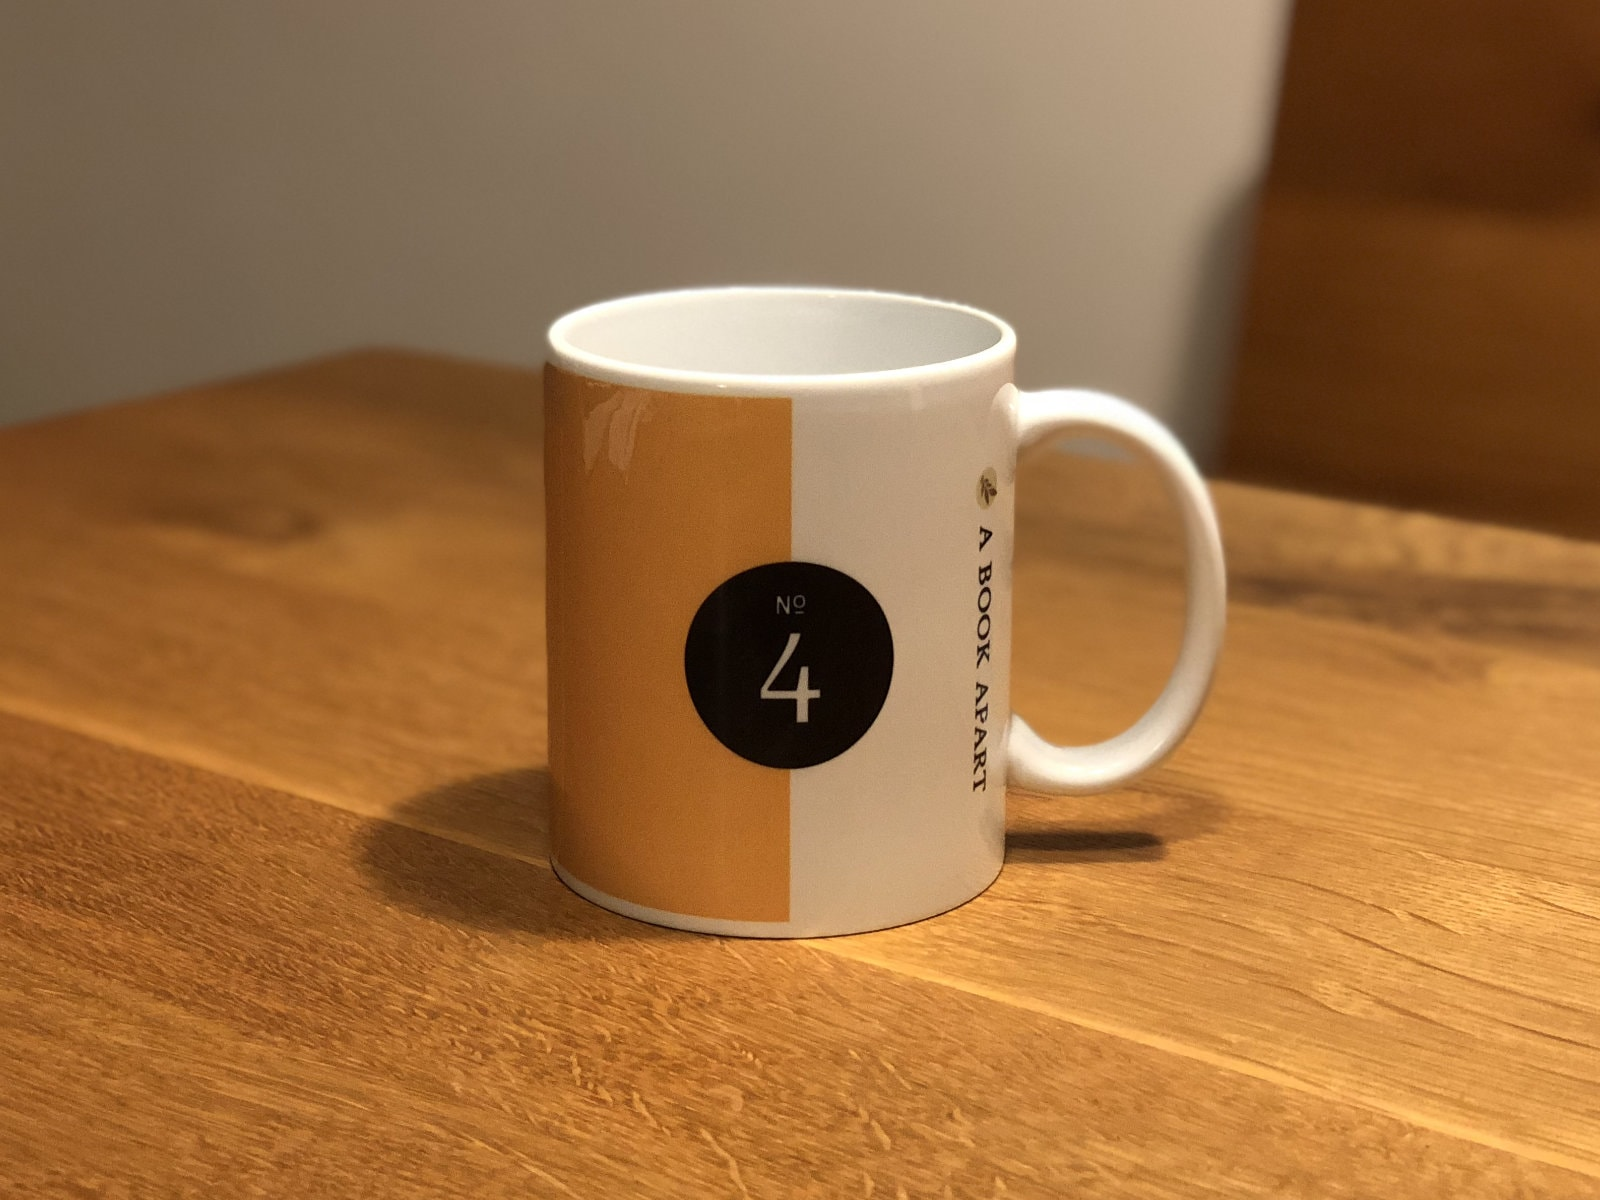 Responsive Web Designマグカップの裏側。シリーズ番号の「No.4」が印字されてます